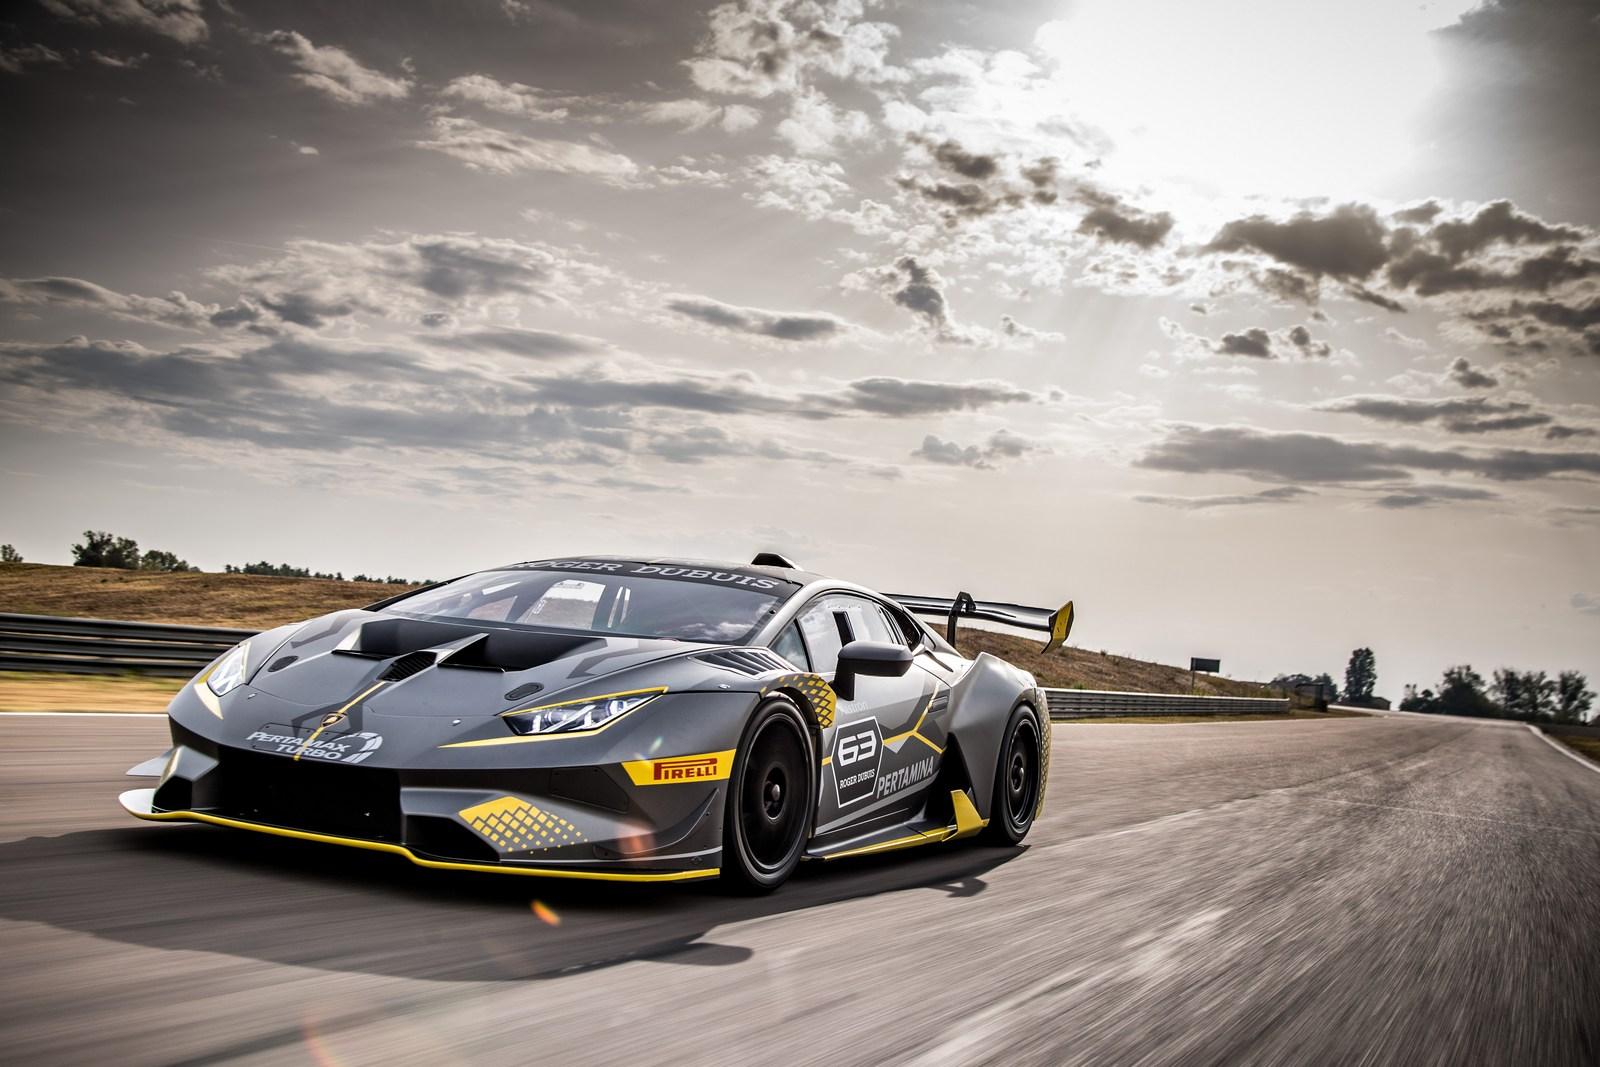 Lamborghini_Huracan_Super_Trofeo_Evo_18